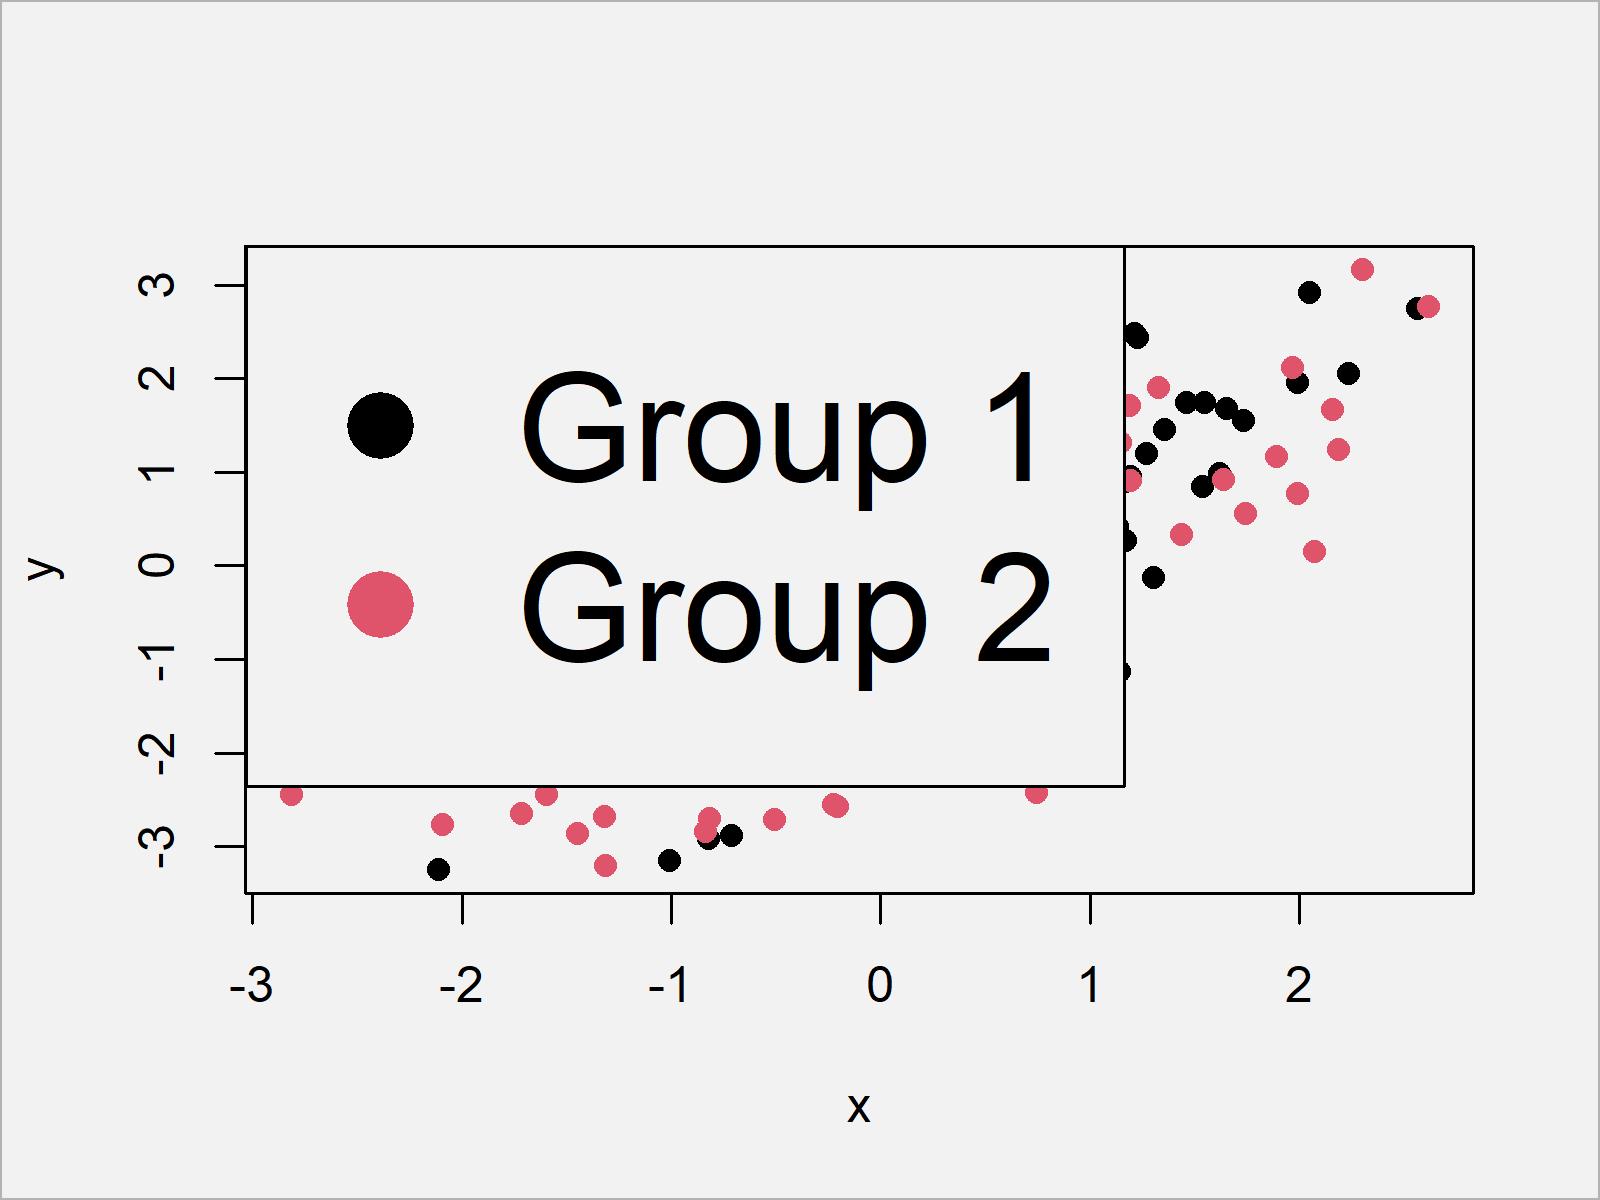 r graph figure 6 add legend base